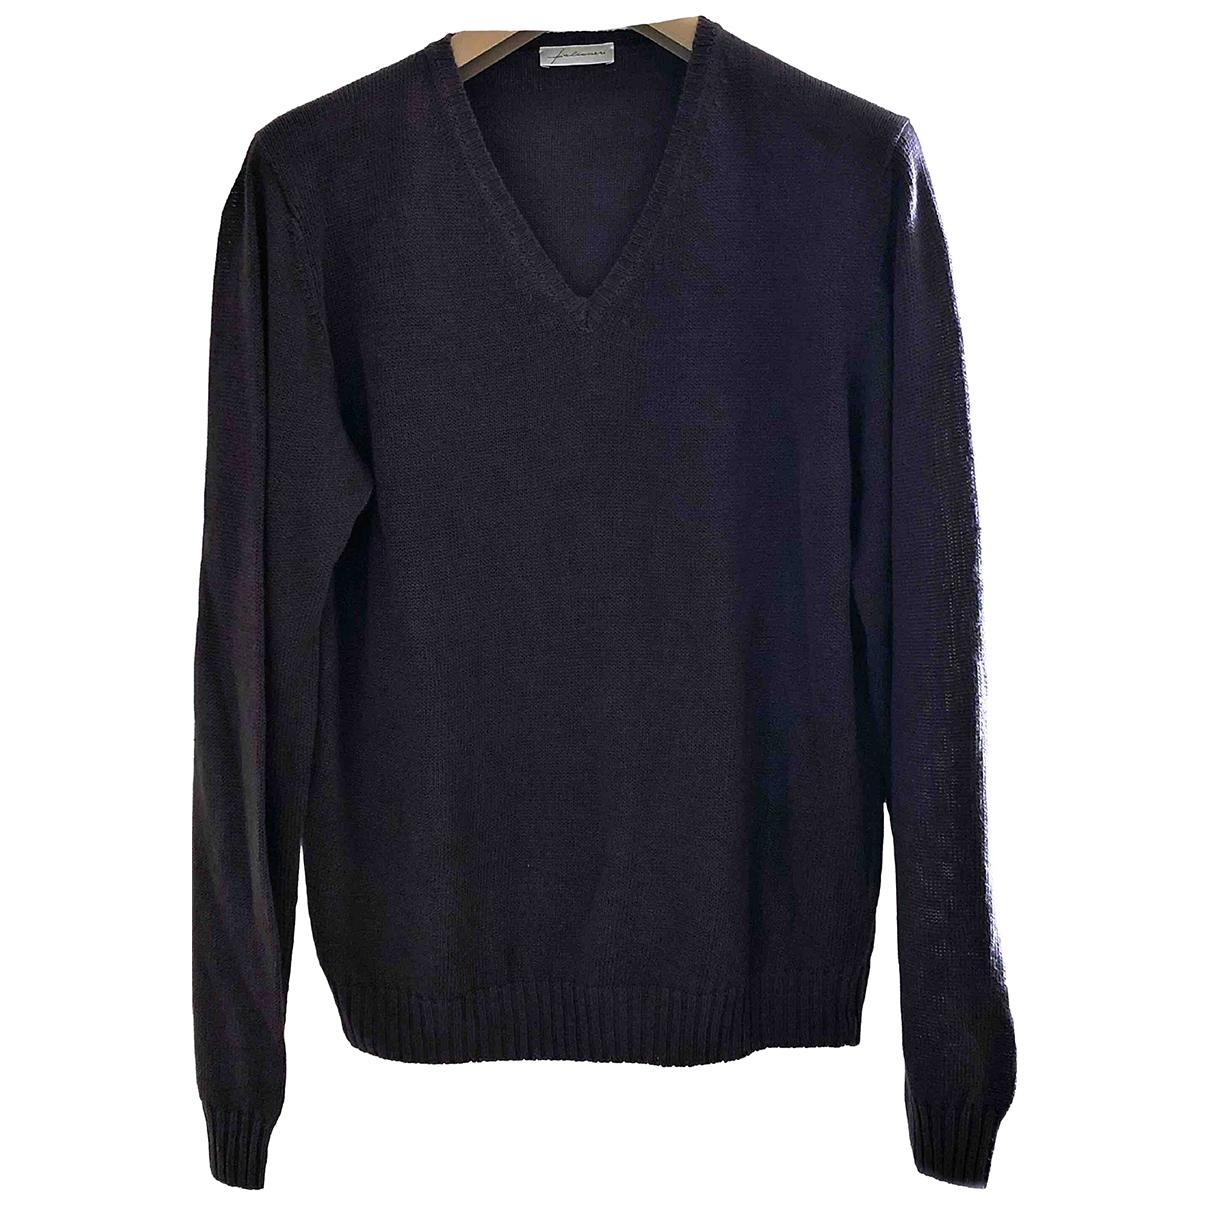 Falconeri \N Anthracite Cotton Knitwear & Sweatshirts for Men 50 IT